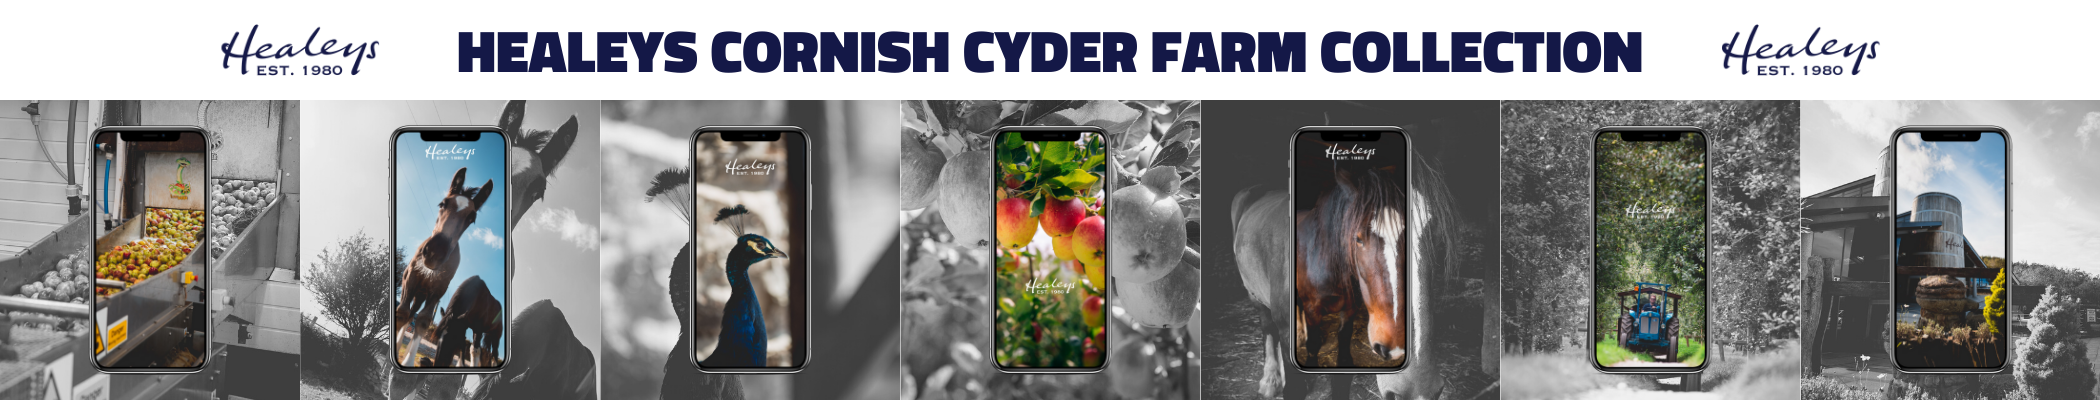 Healeys Cornish Cyder Farm Collection